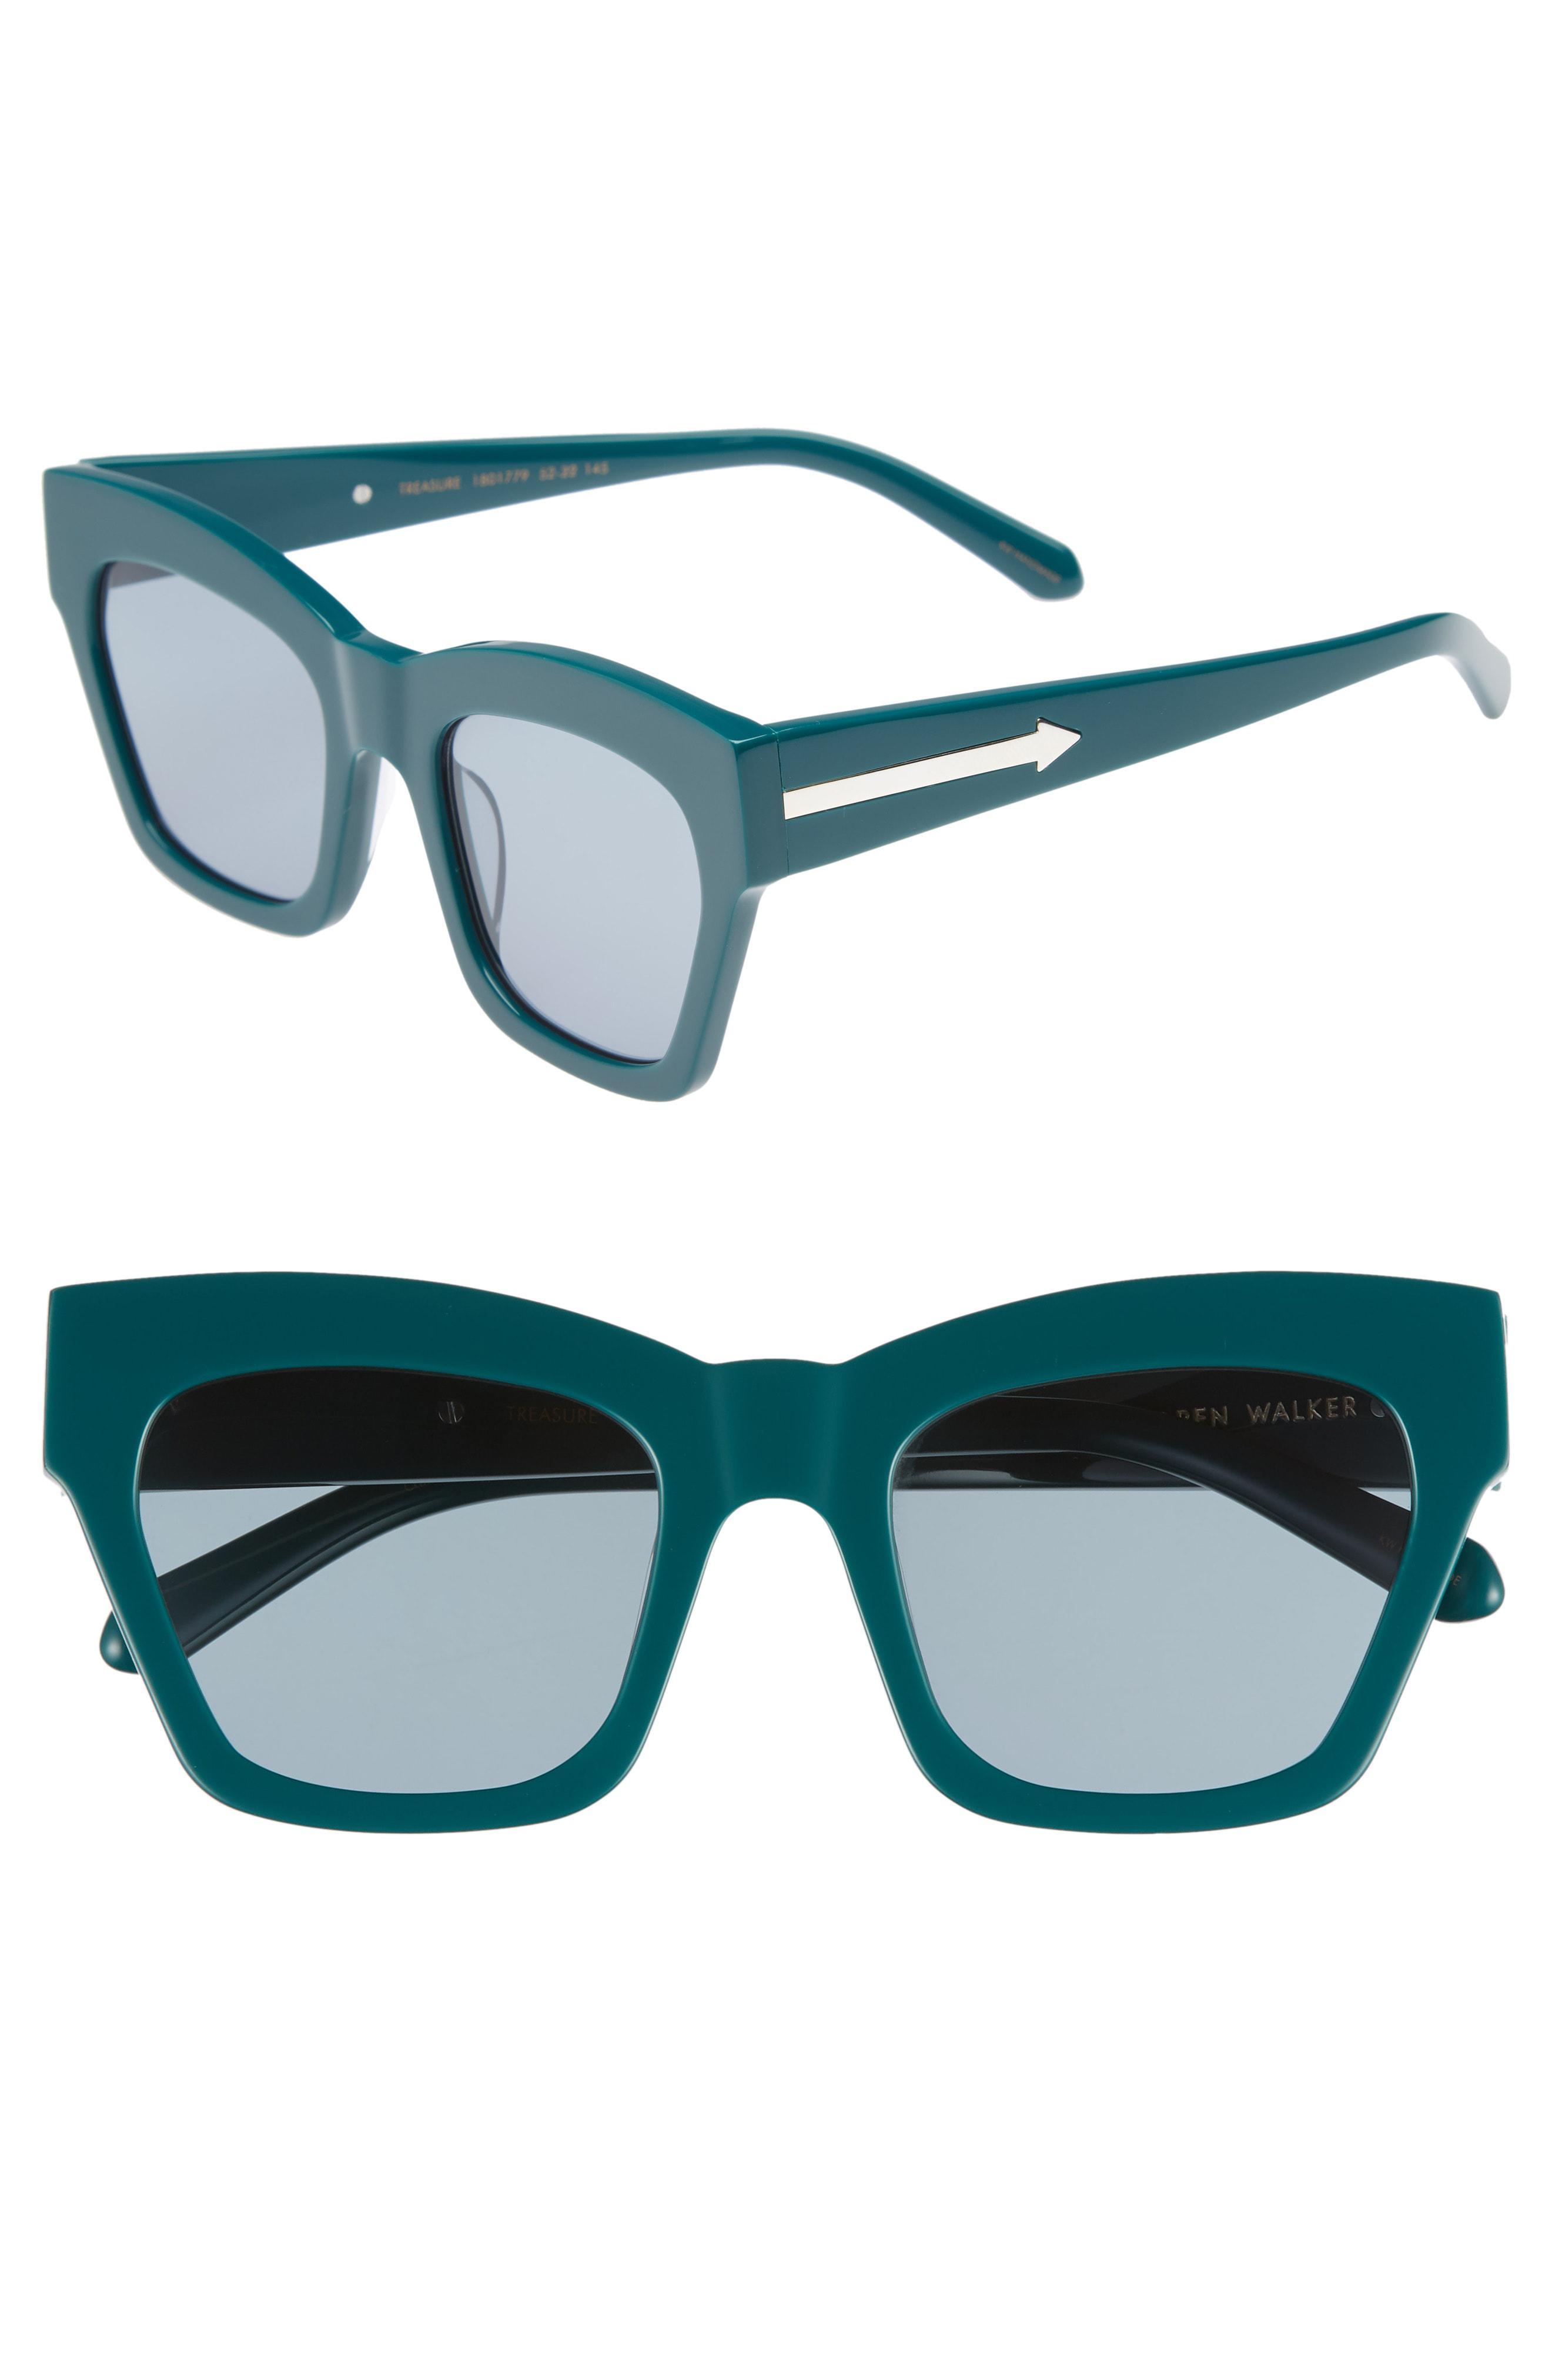 975843c3aa5b7 Lyst - Karen Walker Treasure 52mm Cat Eye Sunglasses - in Blue ...